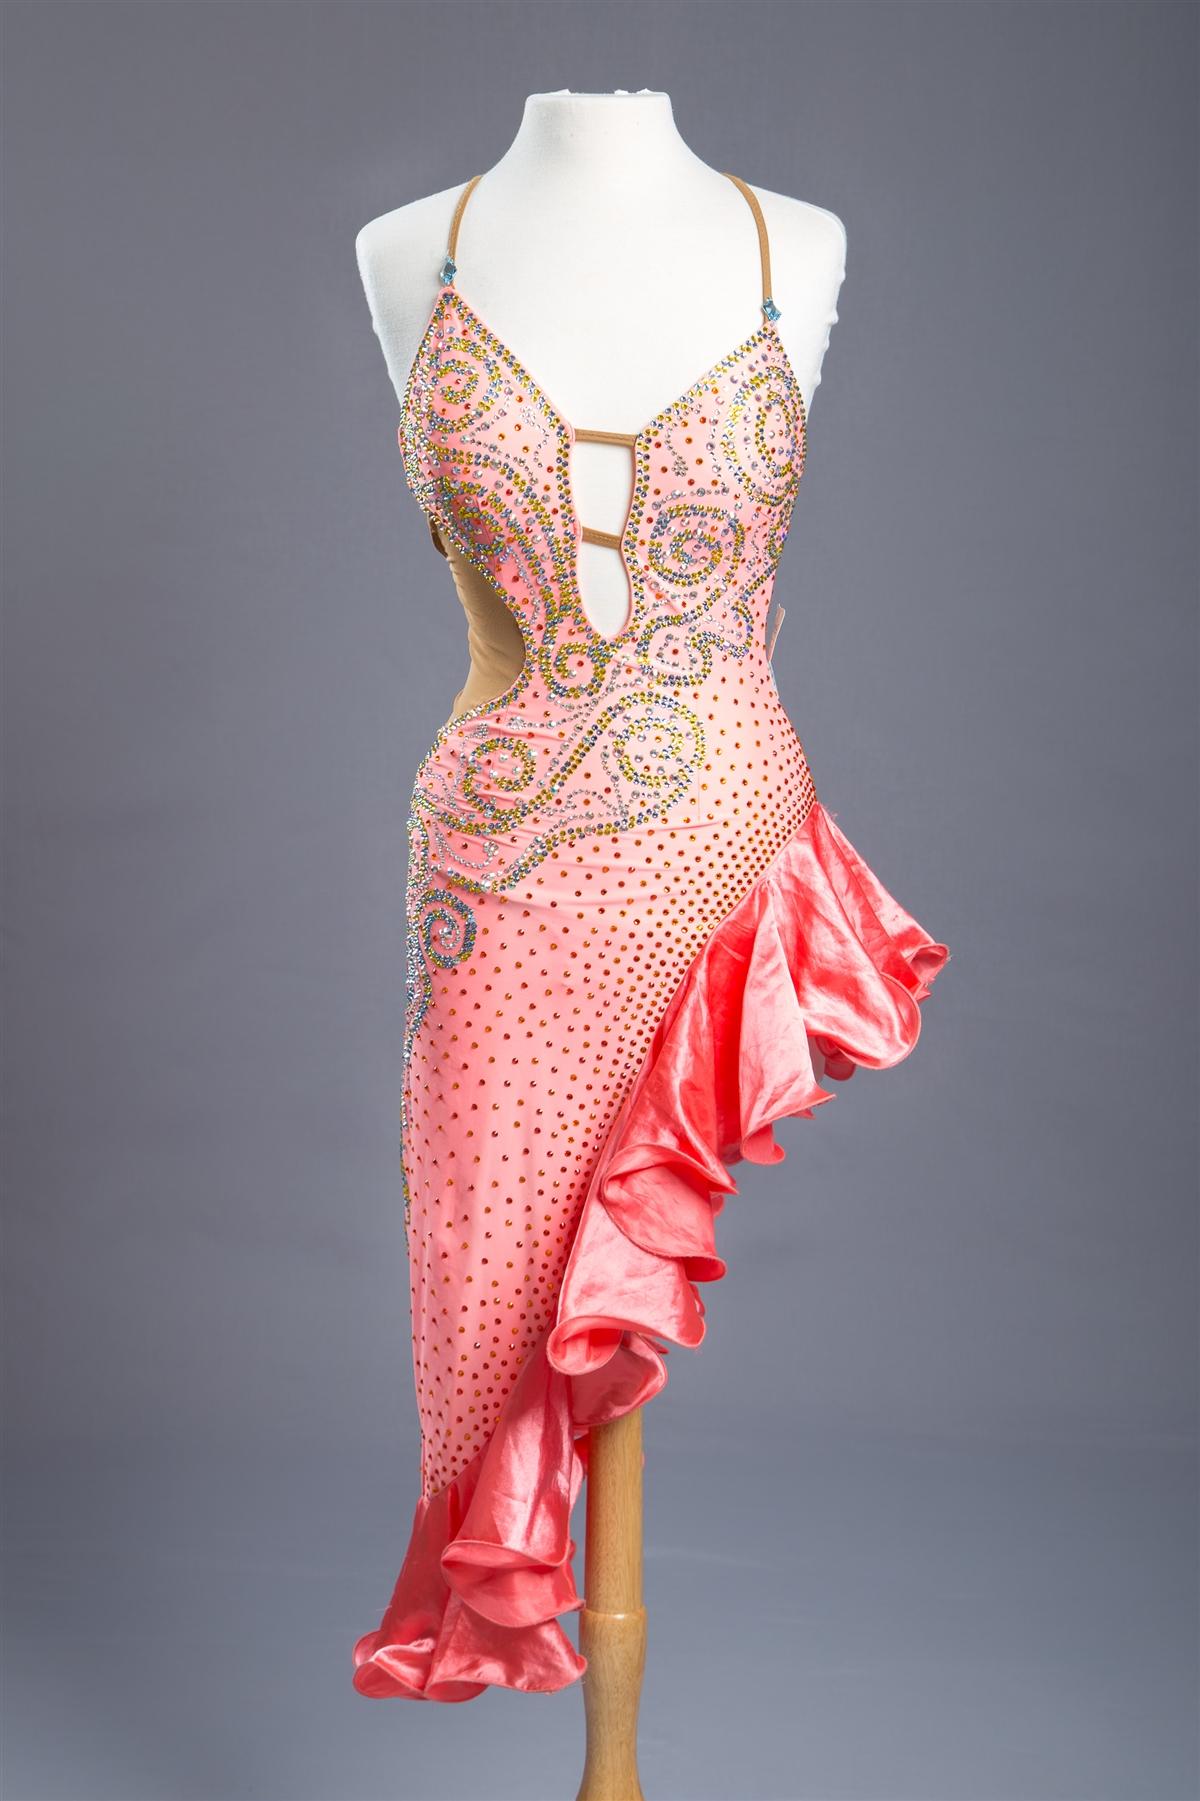 Sexy dancing dress